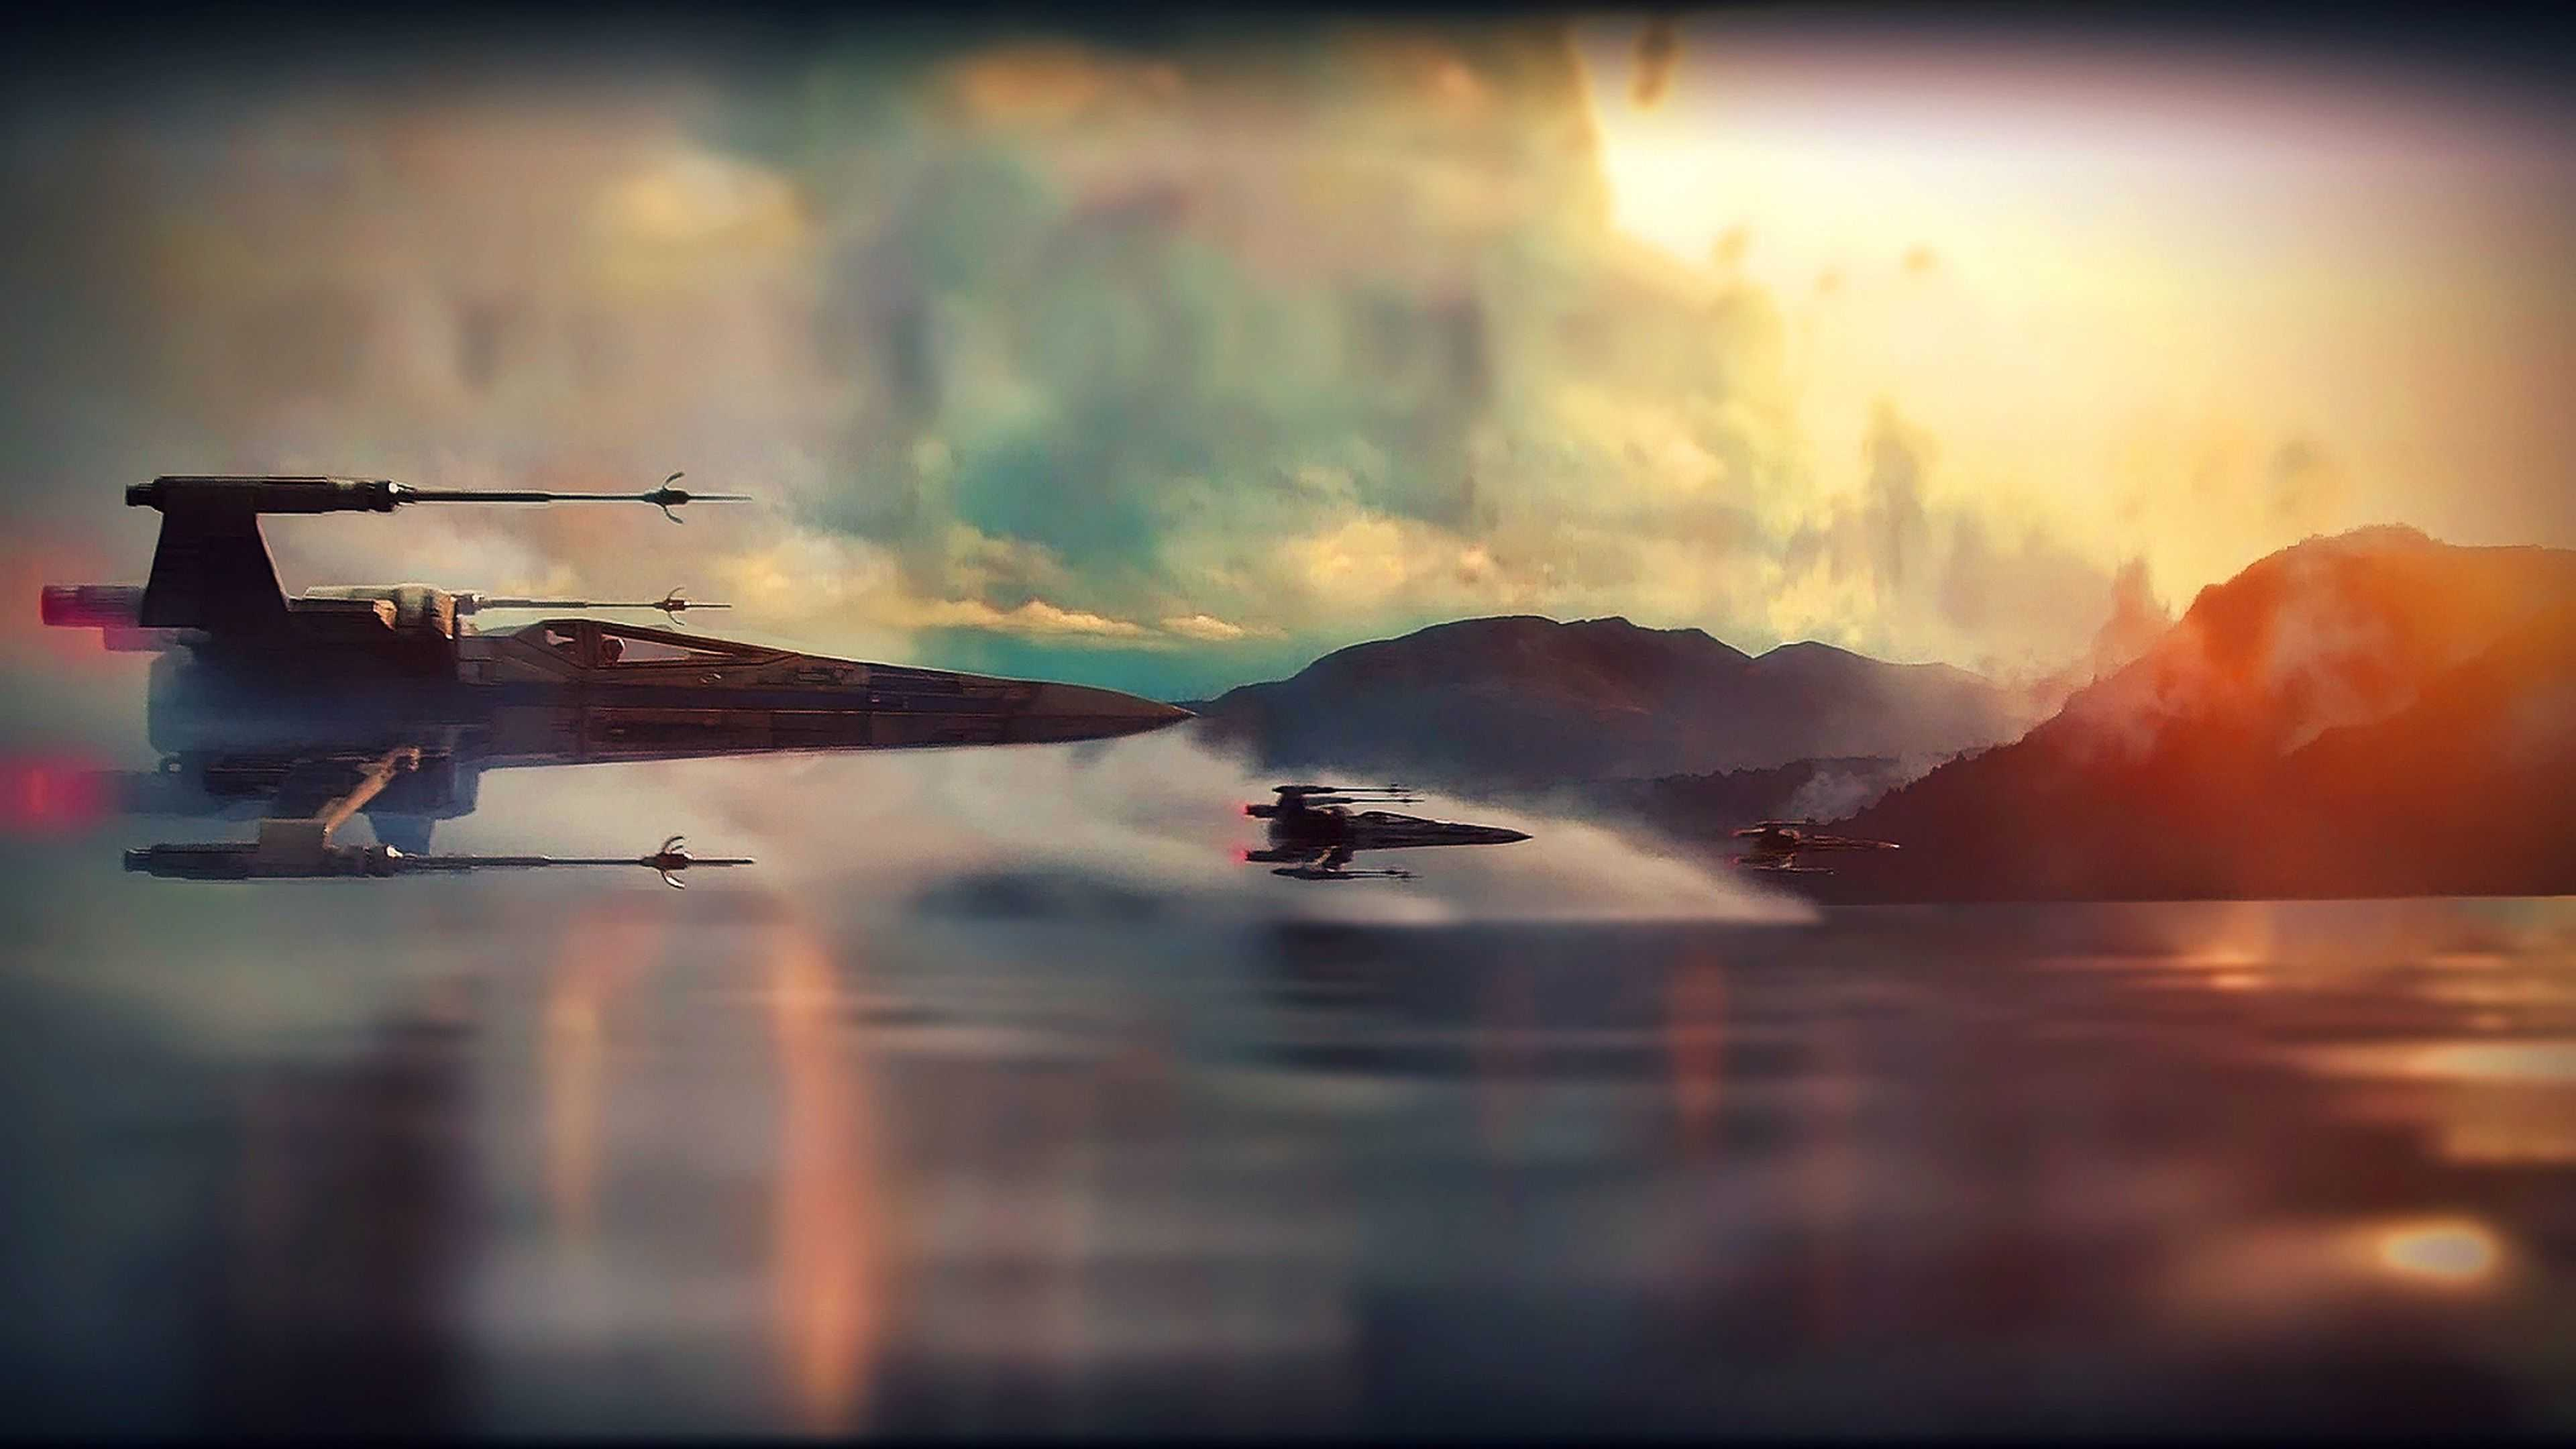 Star Wars Landscape Wallpaper On